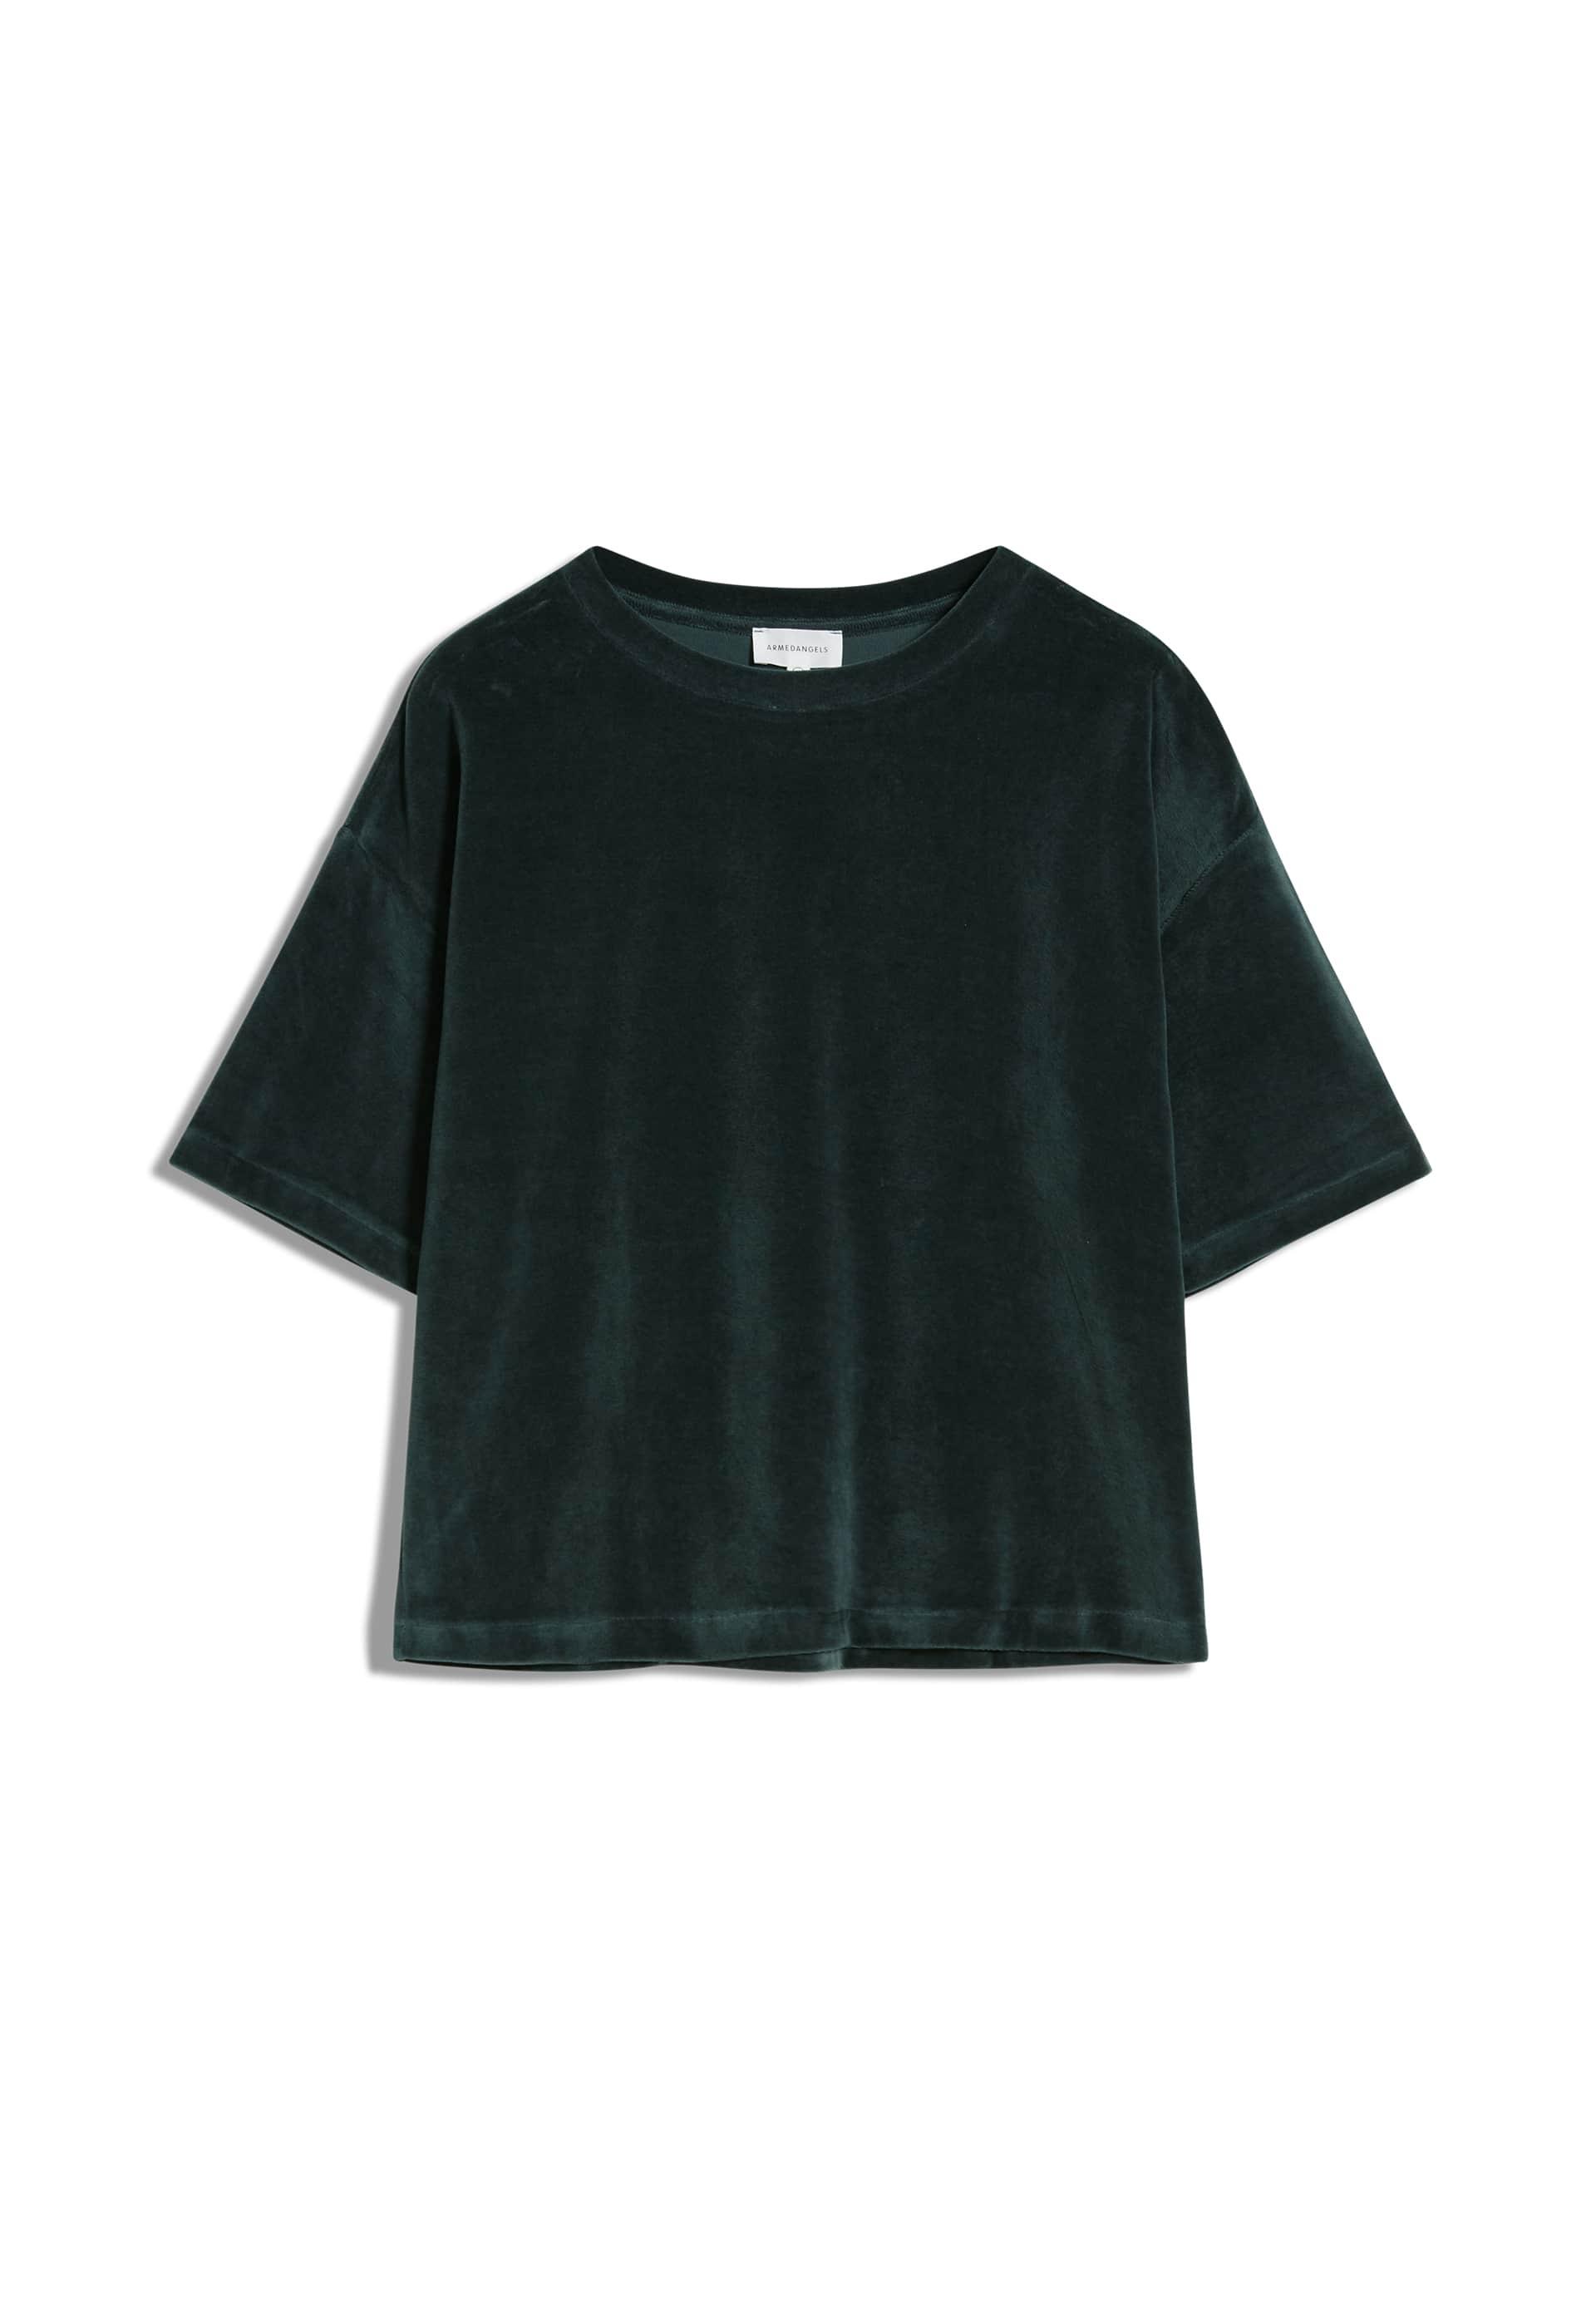 MAARLI T-Shirt made of Organic Cotton